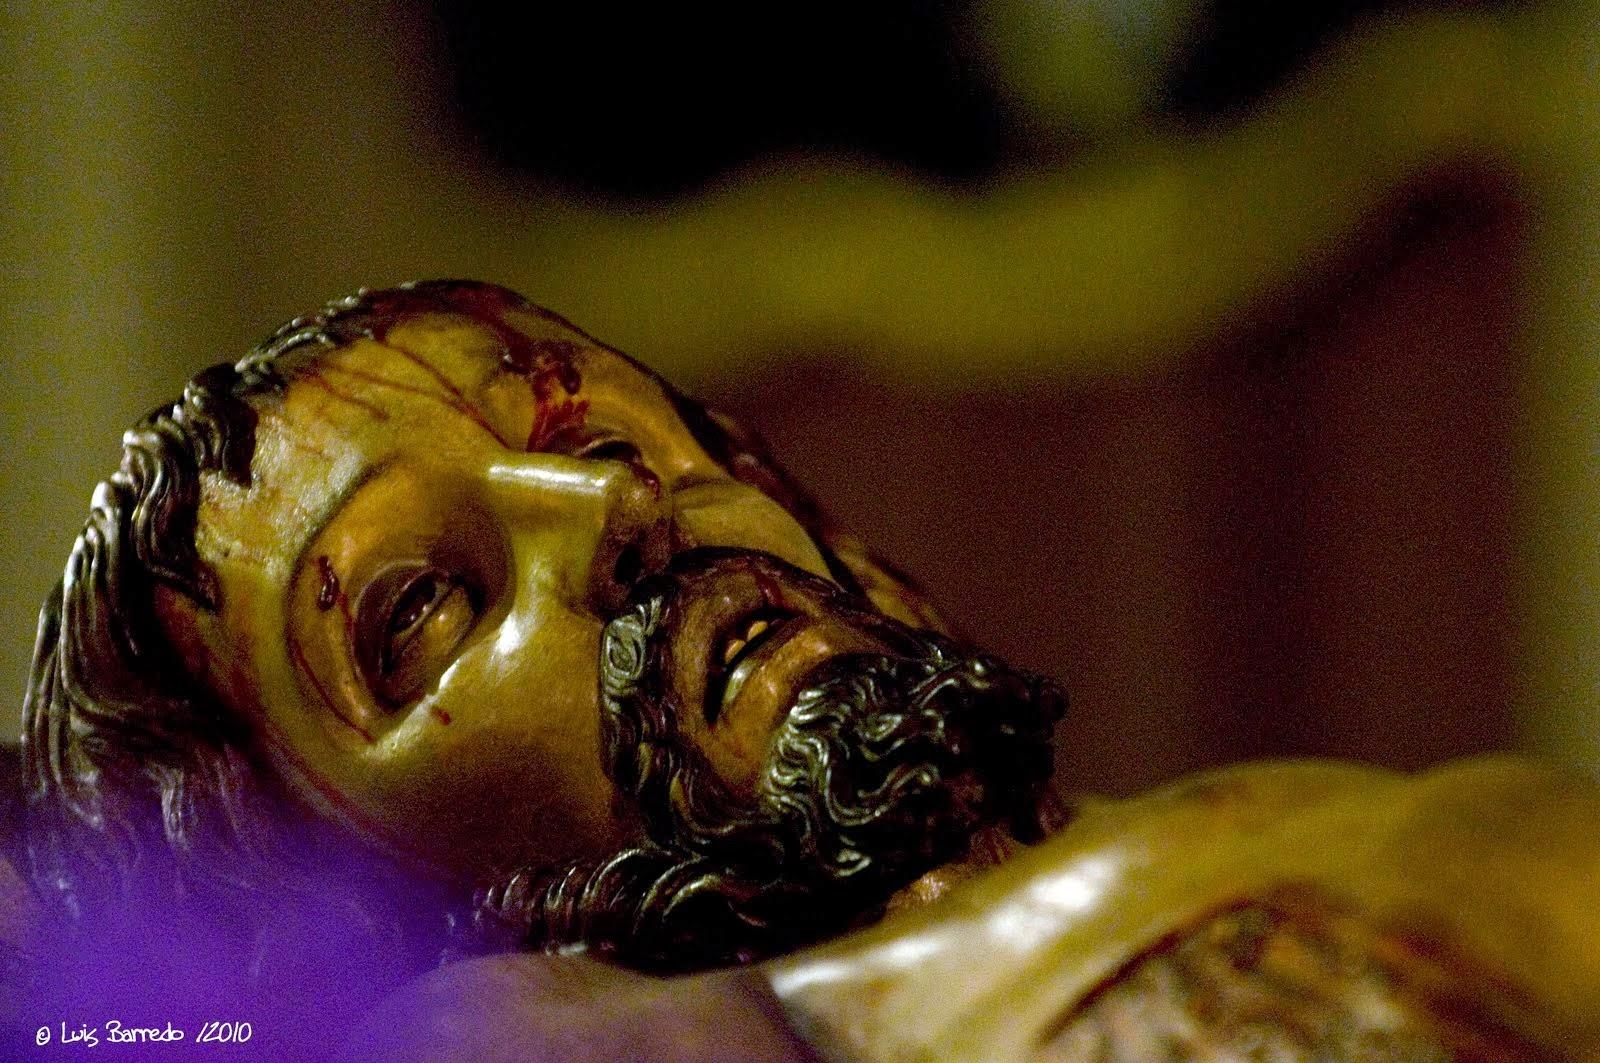 Pila arte 2 gregorio fern ndez cristo yacente - Santa ana valladolid ...